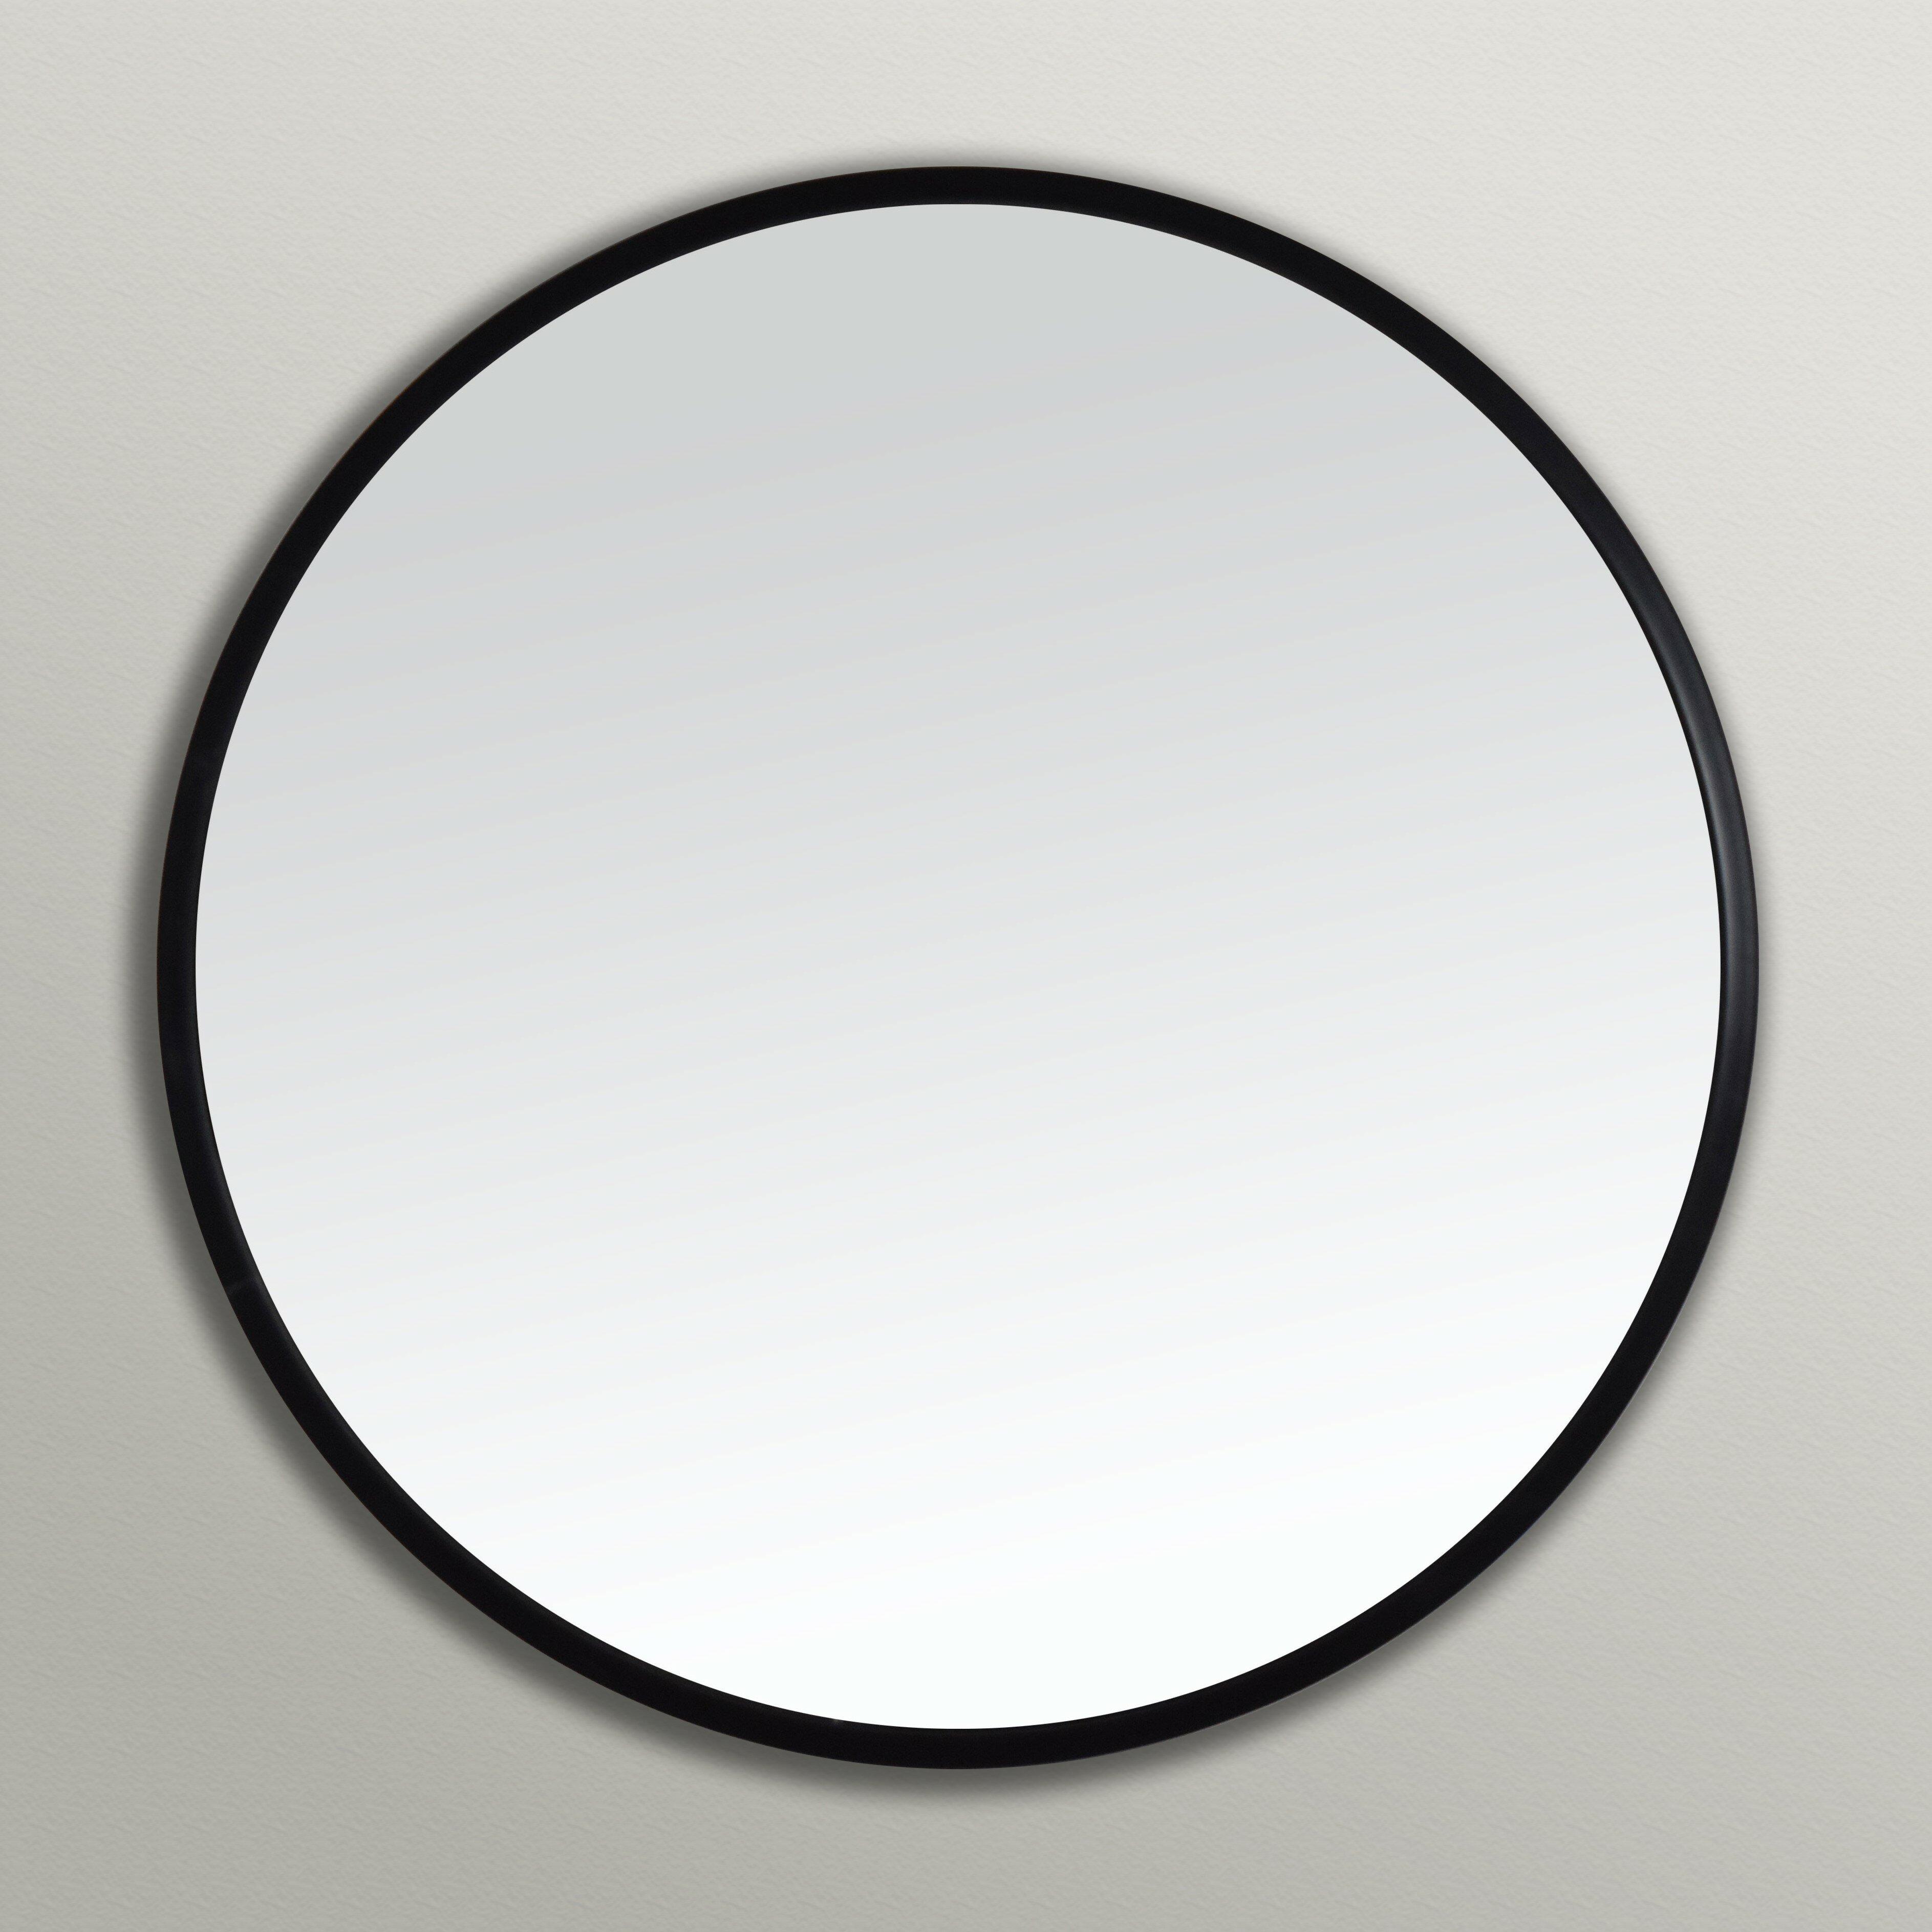 Ebern Designs Clique Modern And Contemporary Wall Mounted Mirror Reviews Wayfair